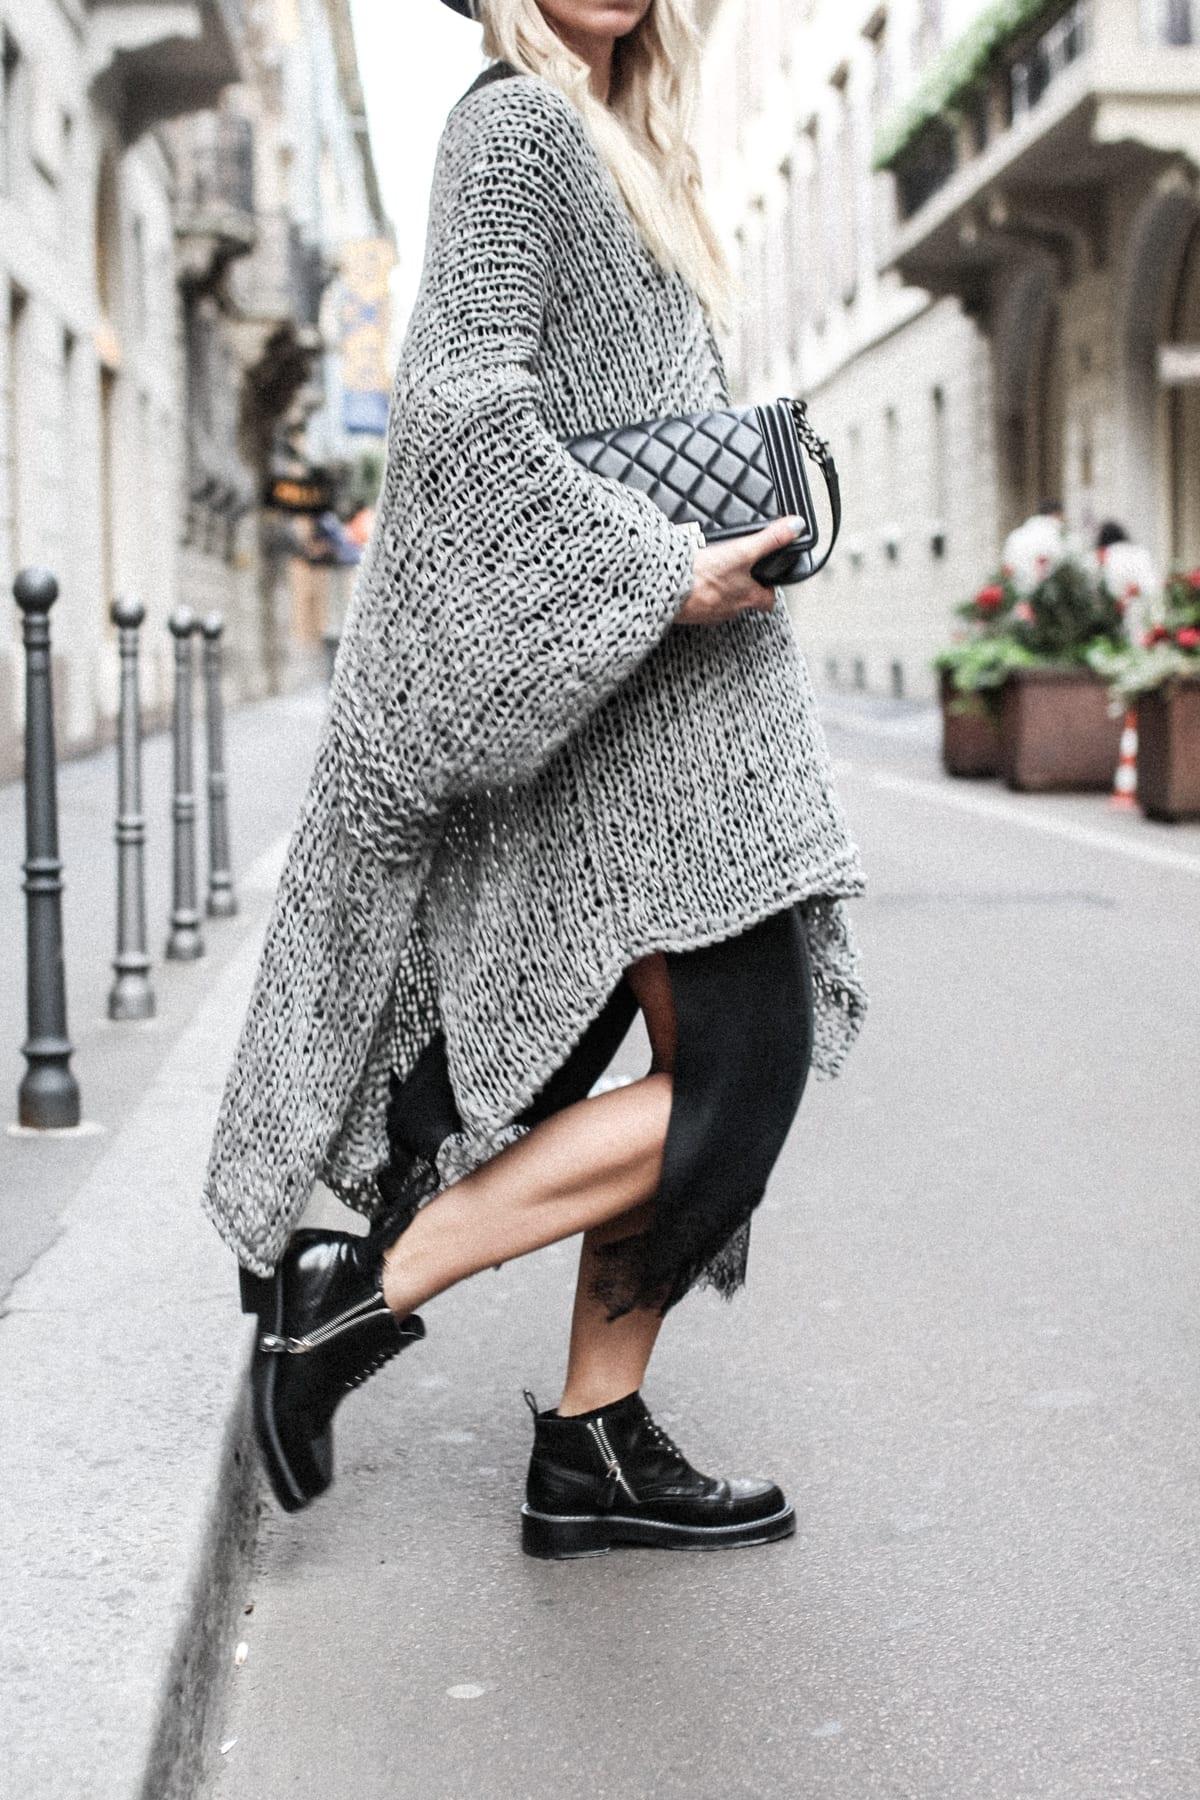 CK_1604_Constantly-K-milano-street-style-fashion-eataly-3759